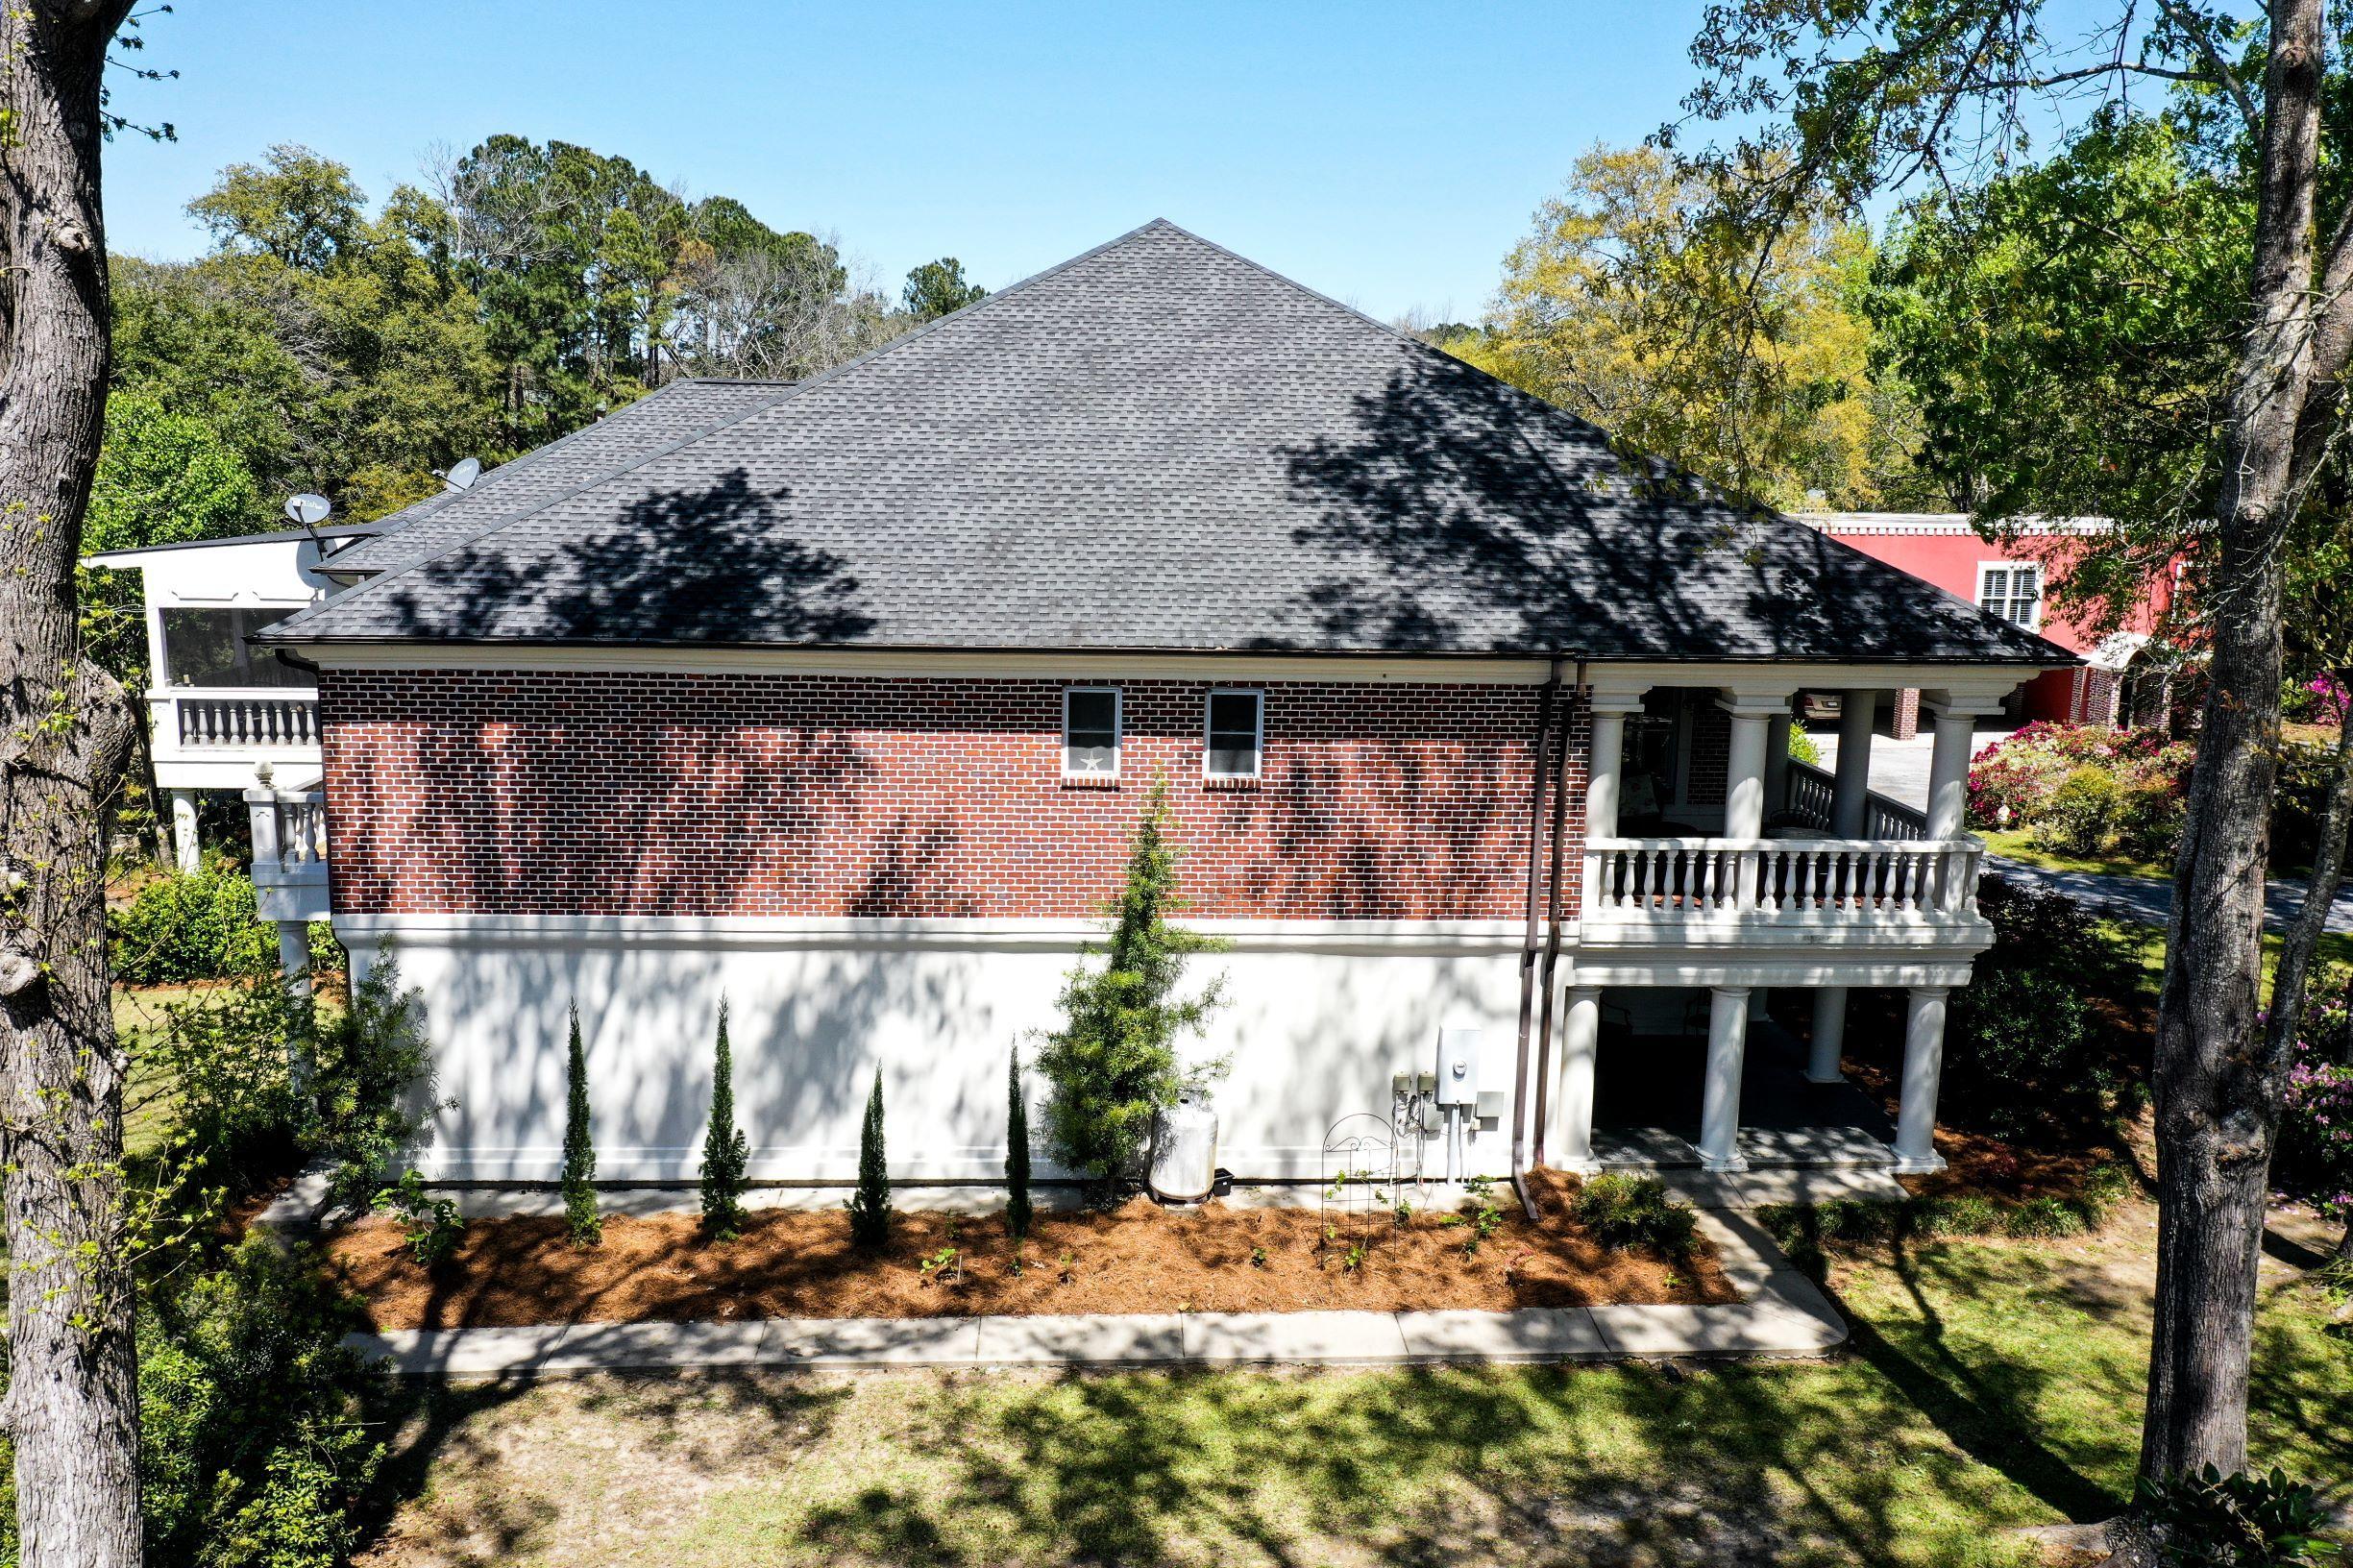 Cainhoy Landing Homes For Sale - 112 Cainhoy Landing, Charleston, SC - 71